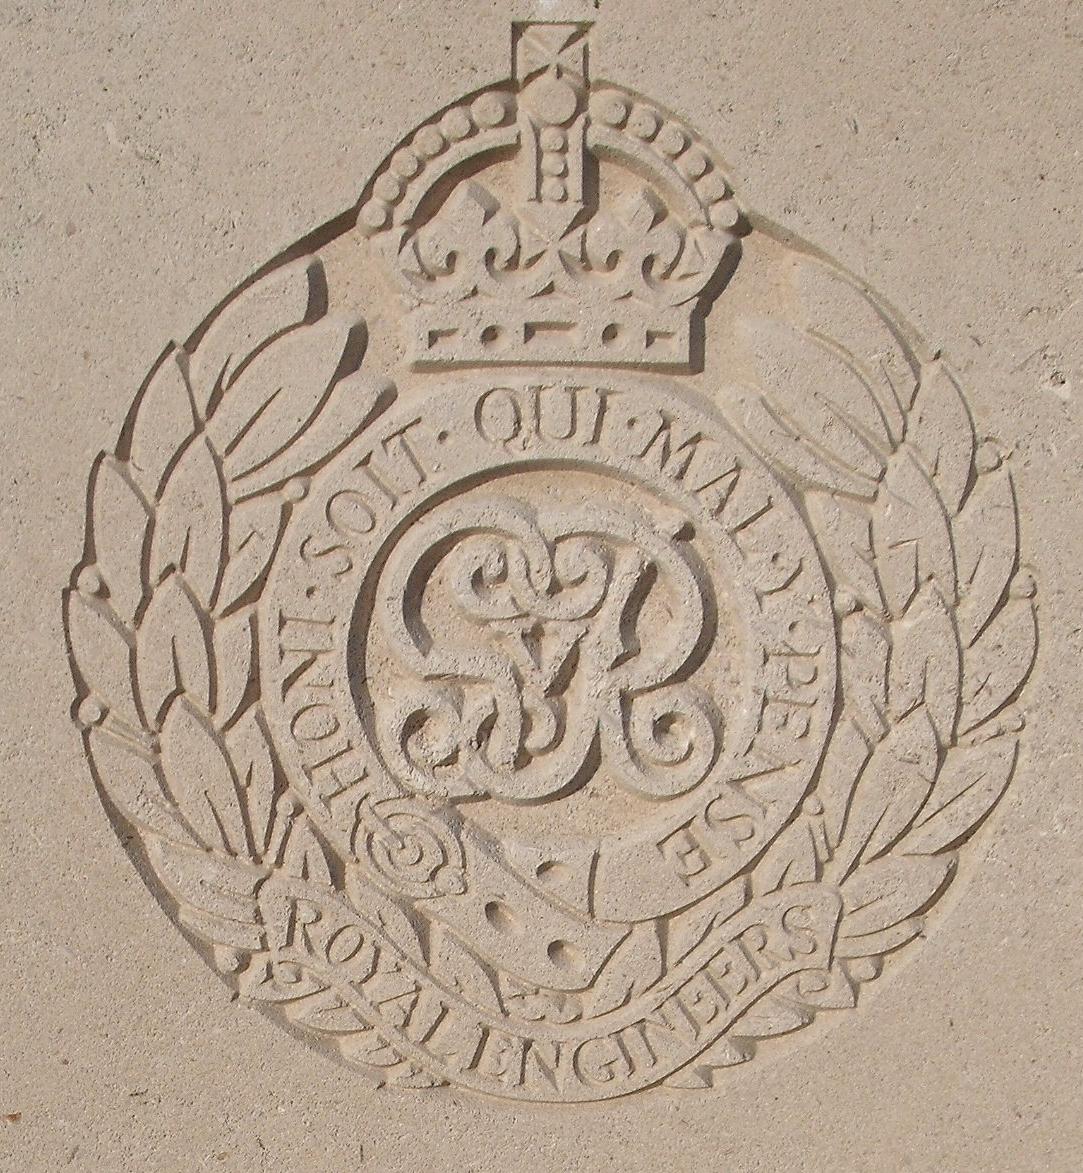 Capbadge of the Royal Engineers